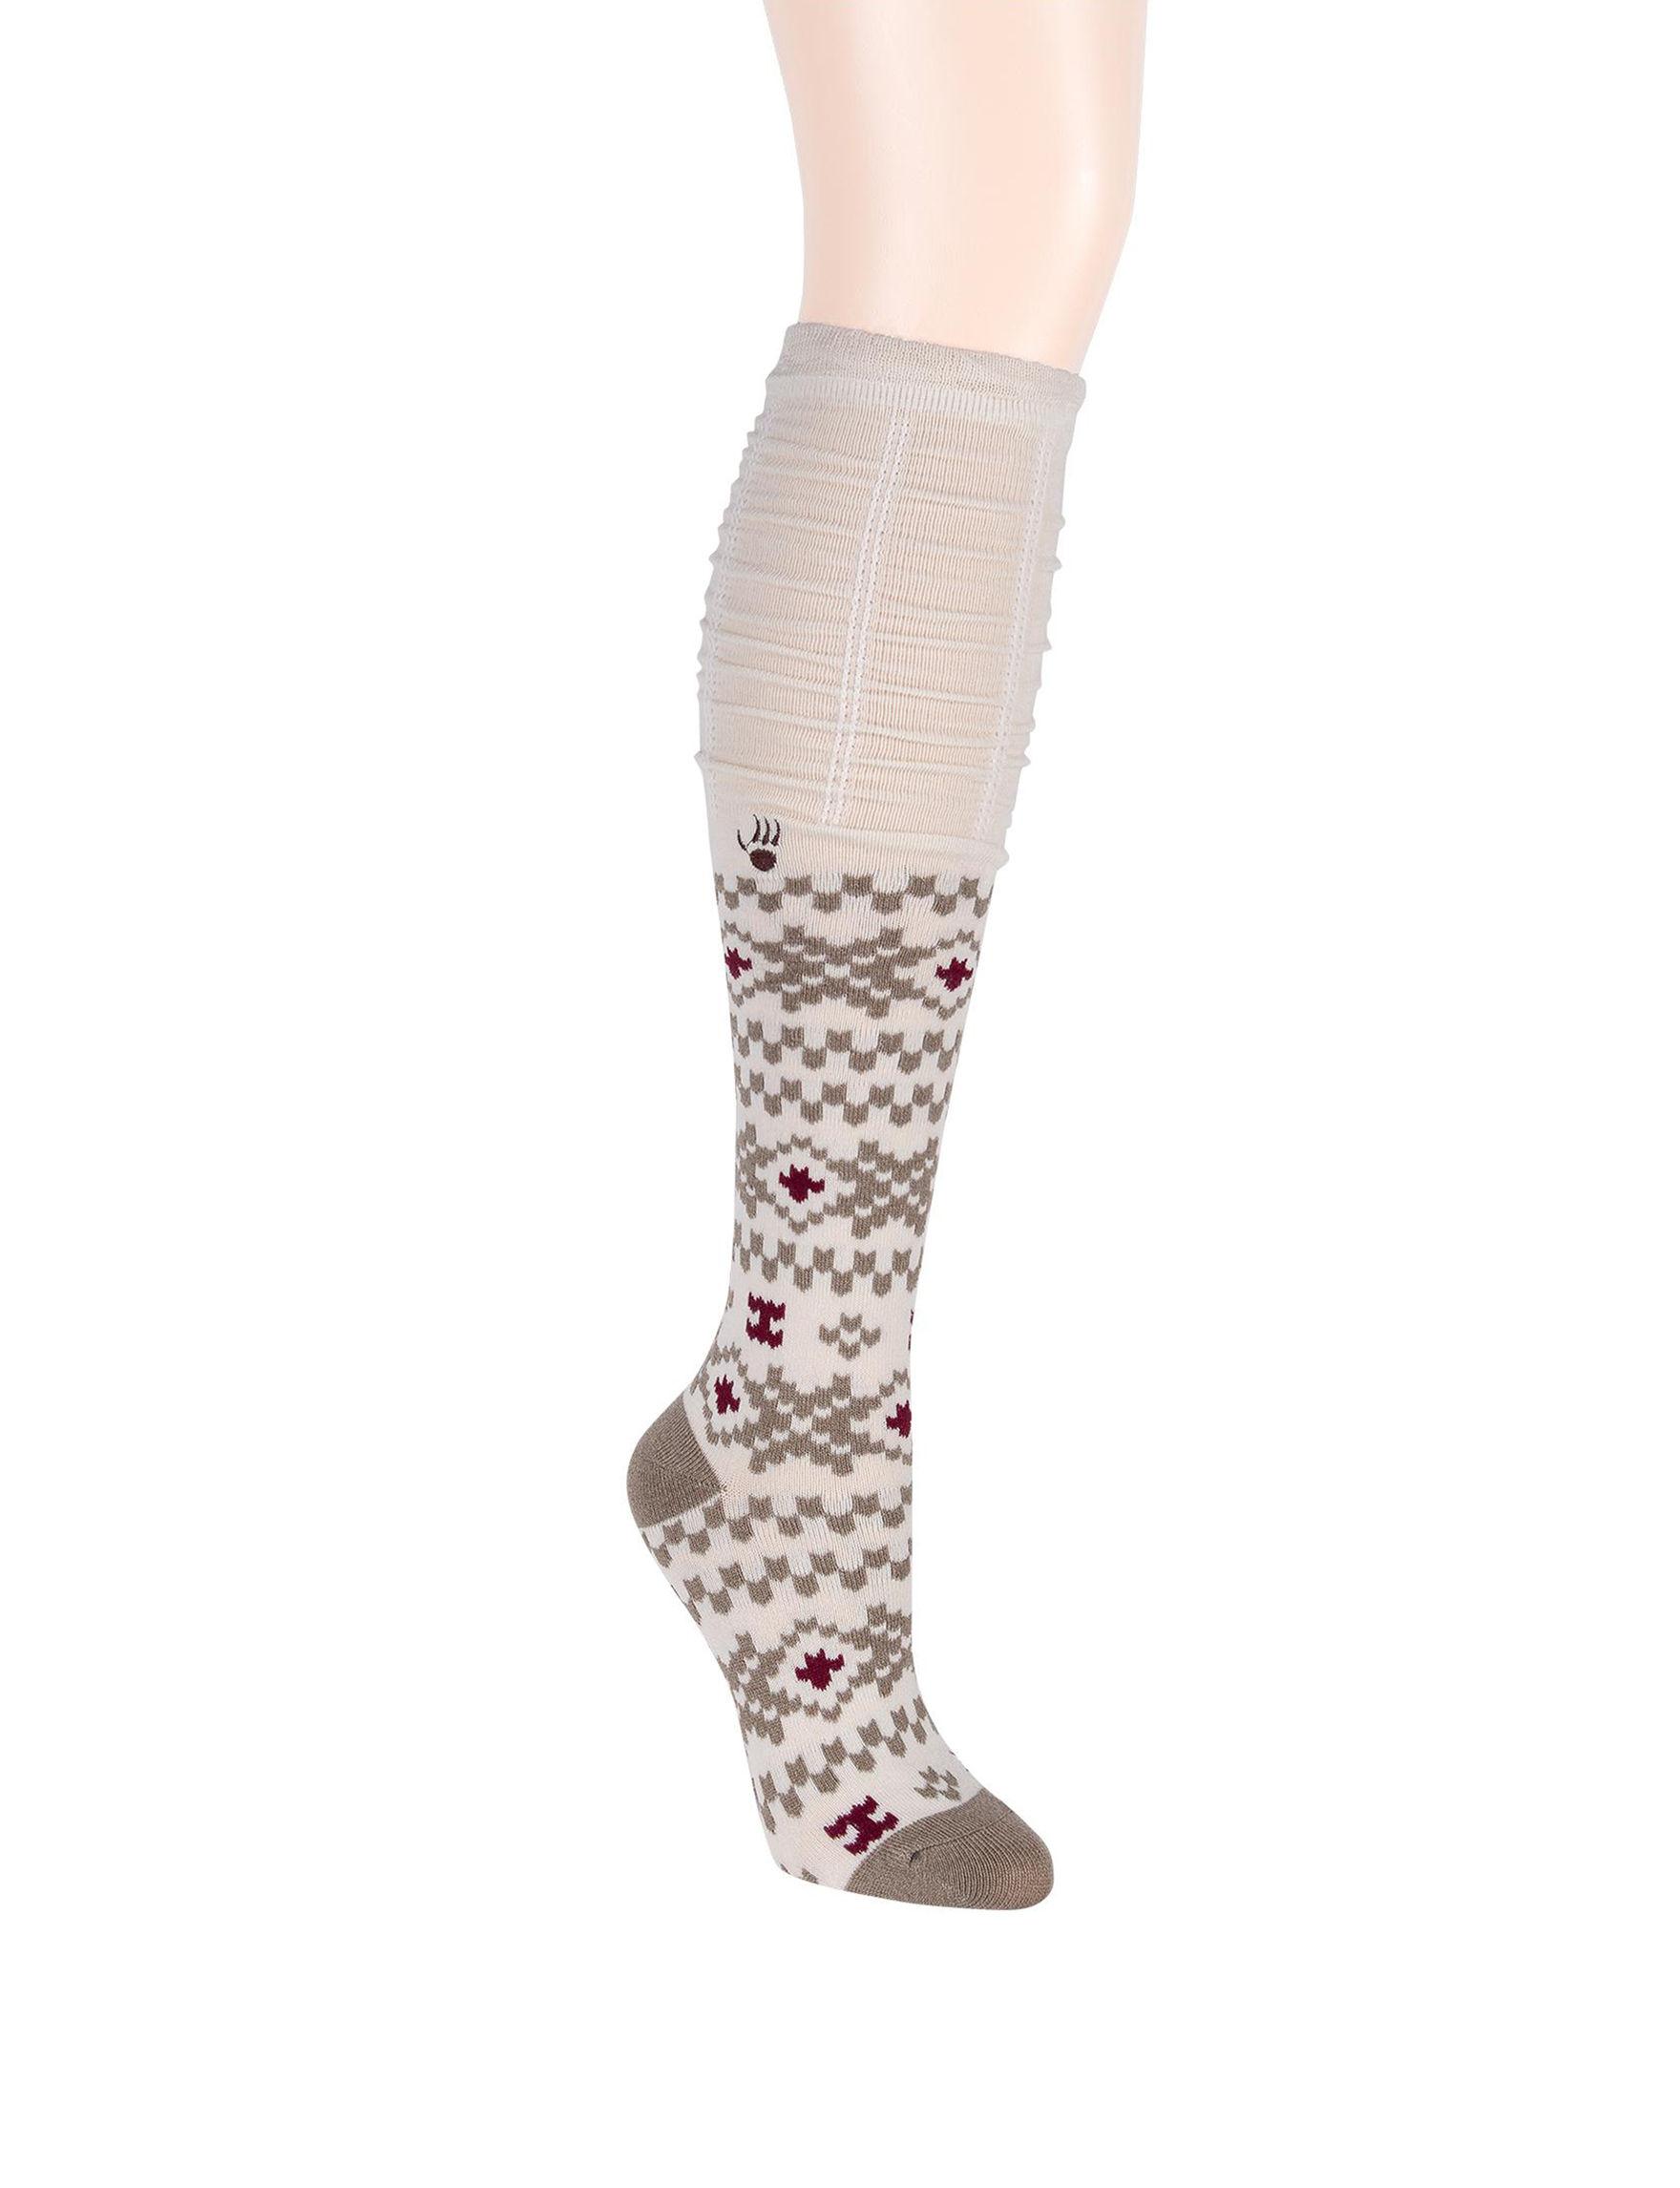 Bearpaw Miscellaneous Socks